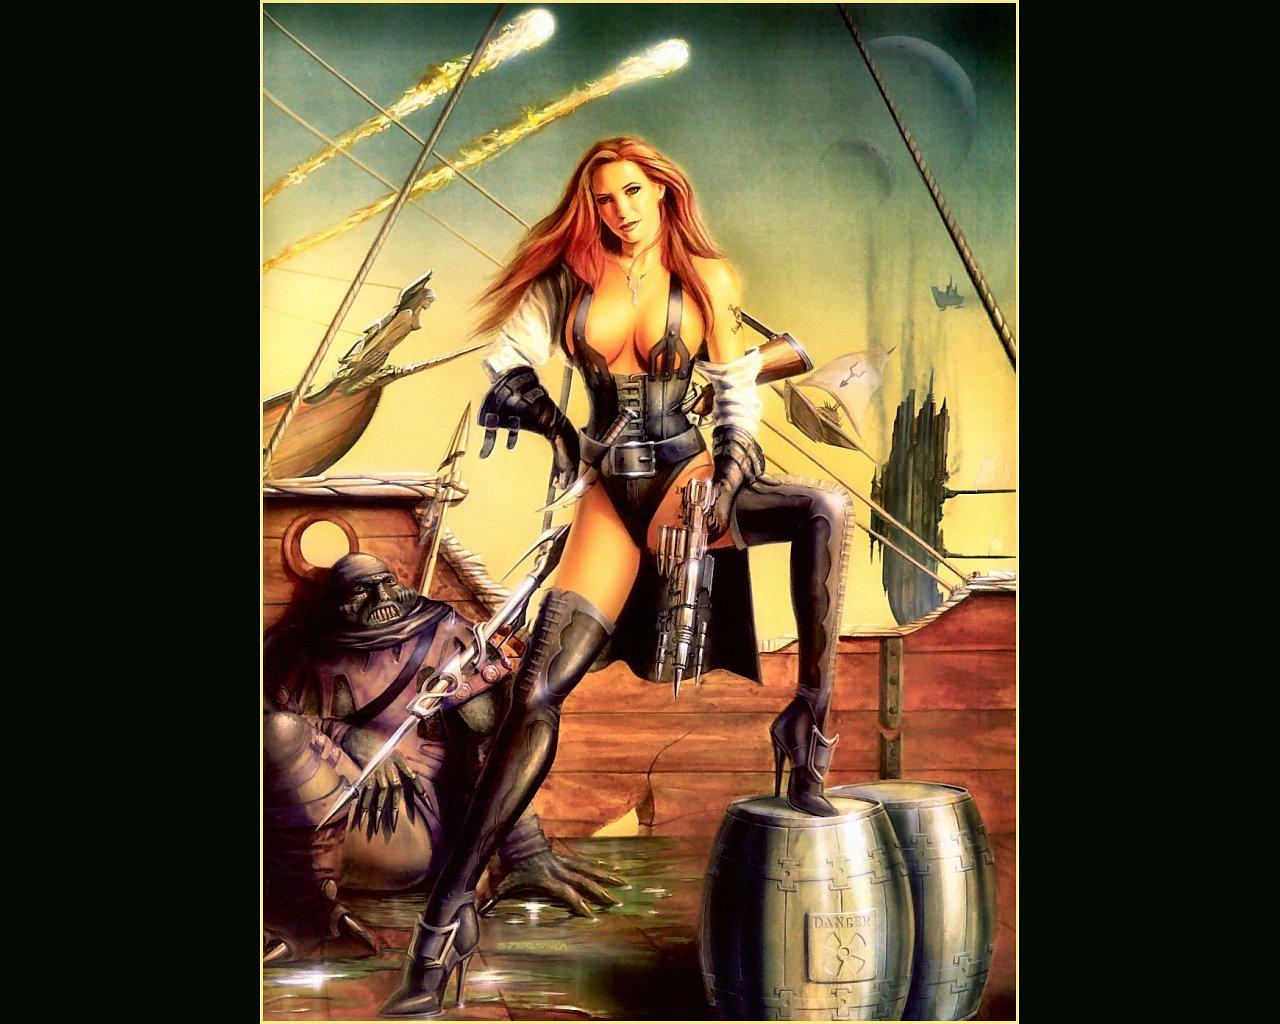 Pirate Babes 65